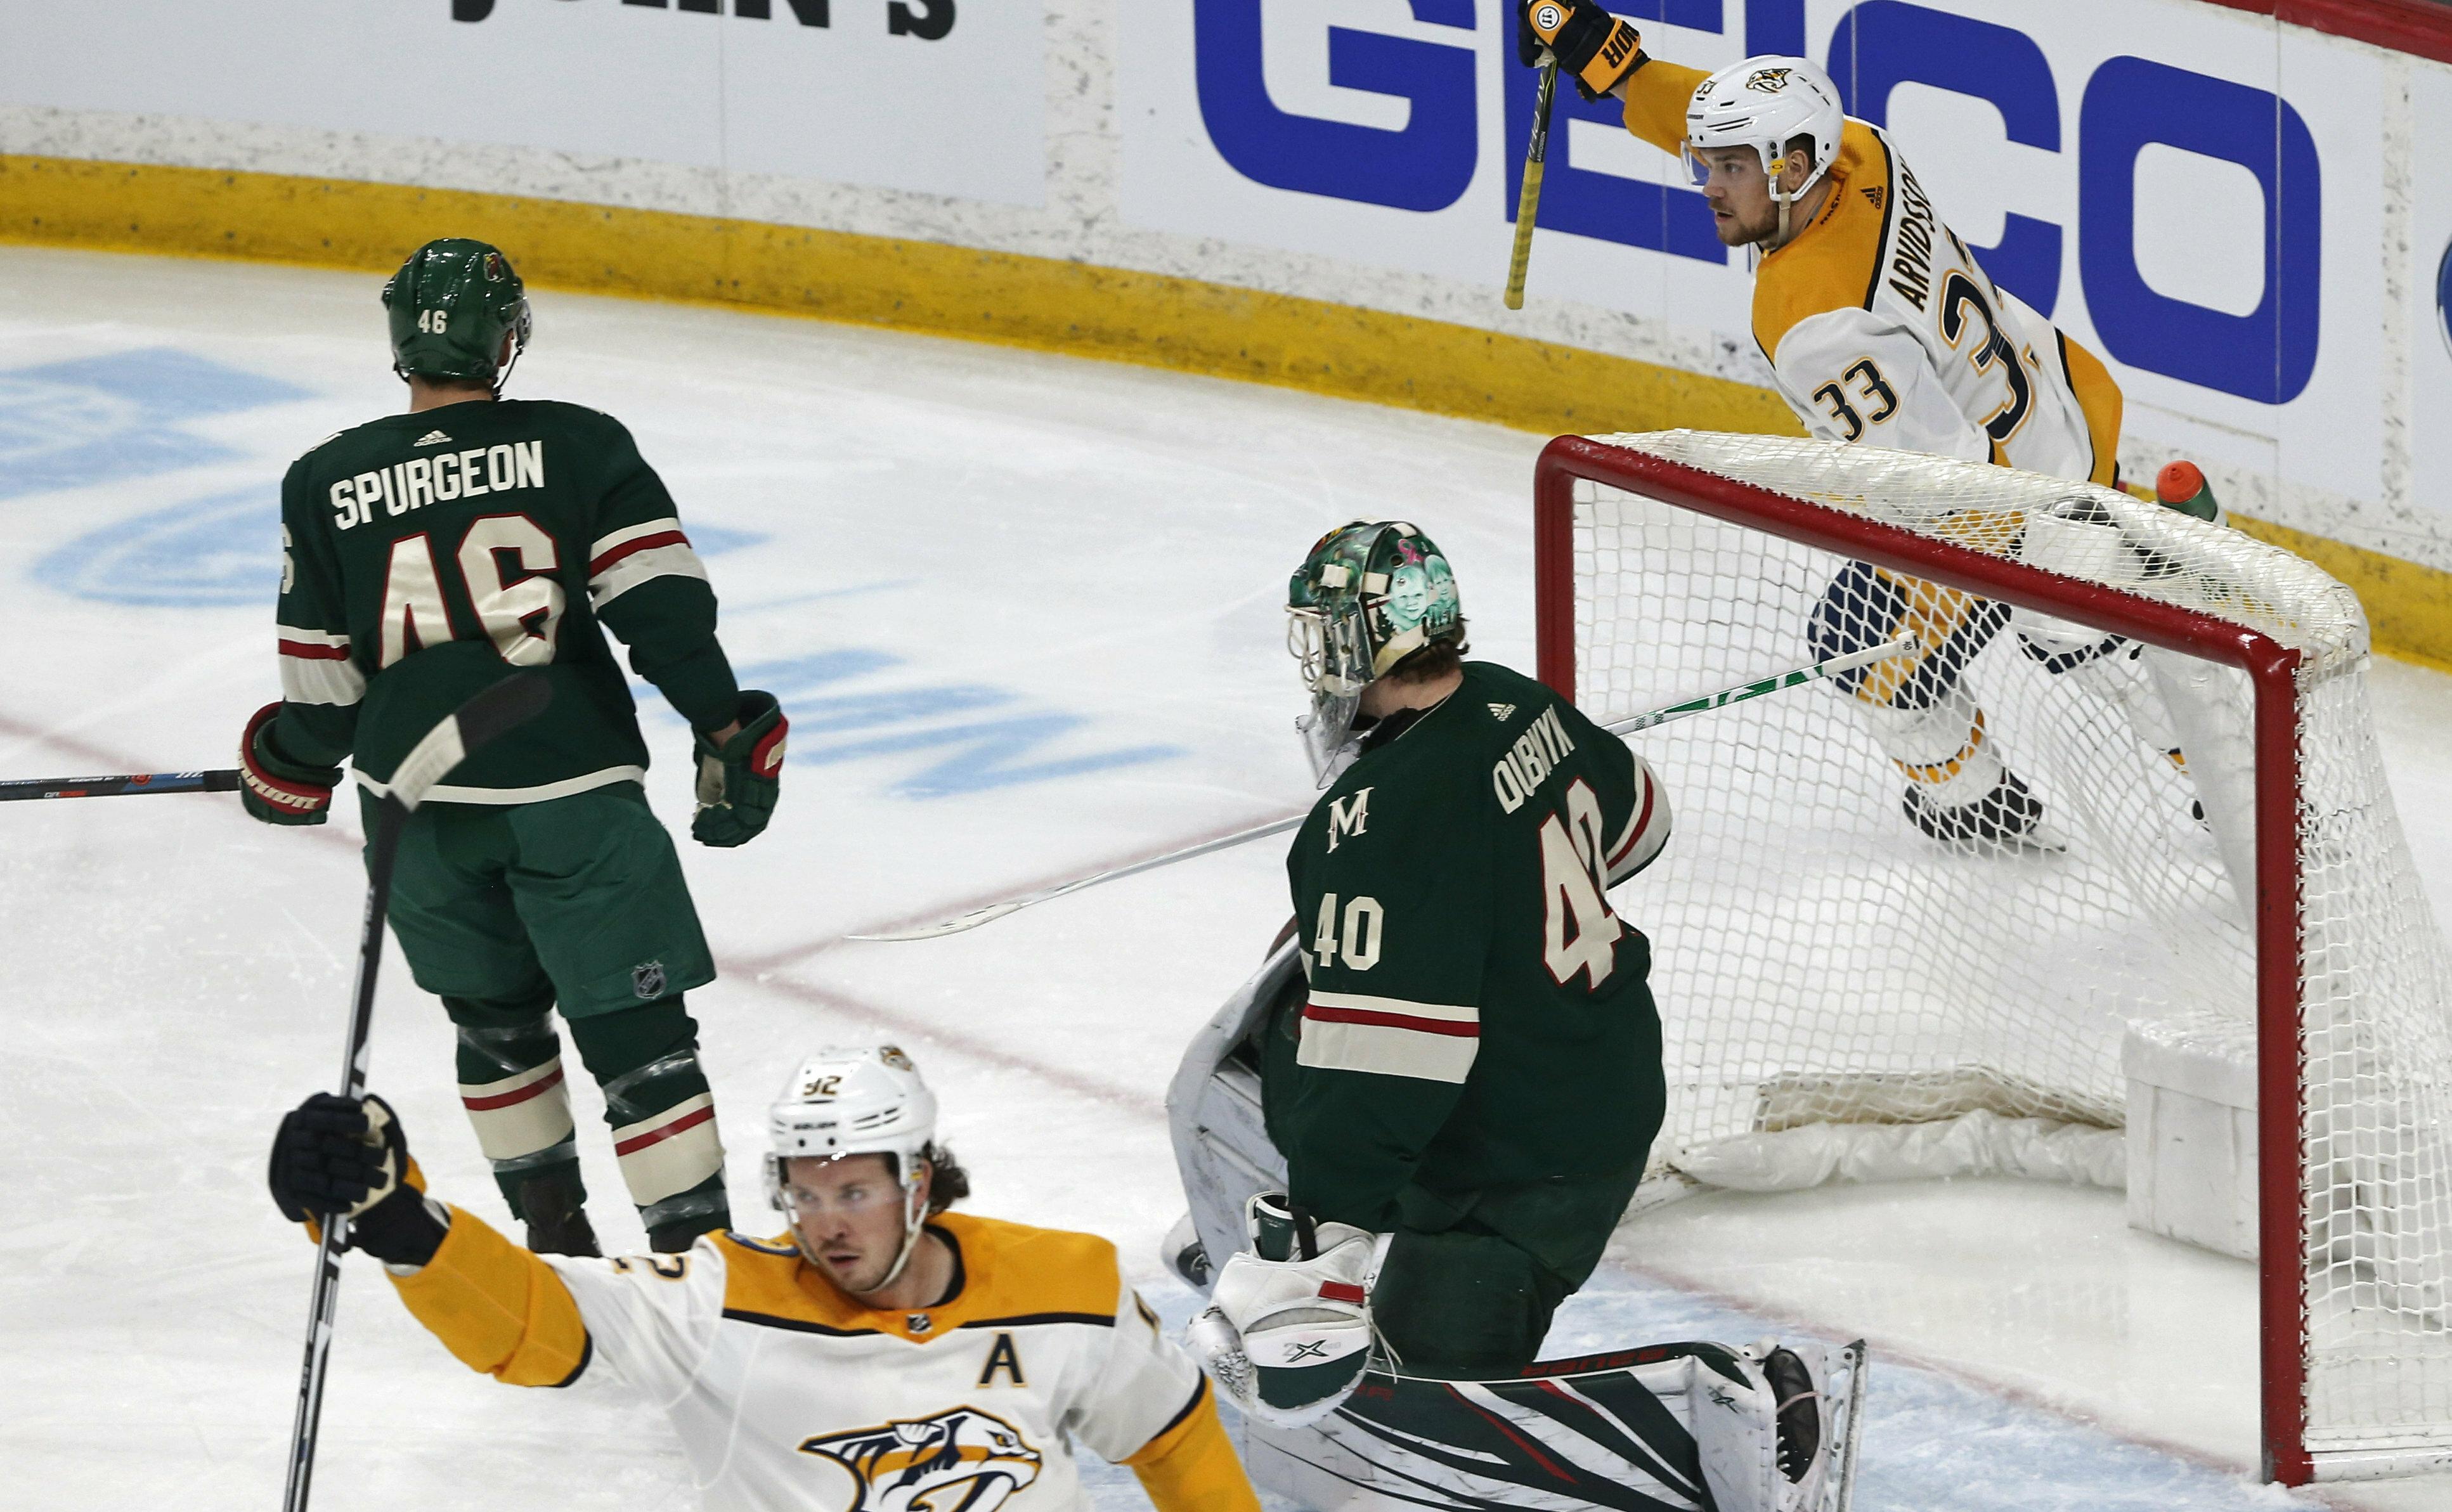 Saros' shutout lifts Predators over Wild 1-0